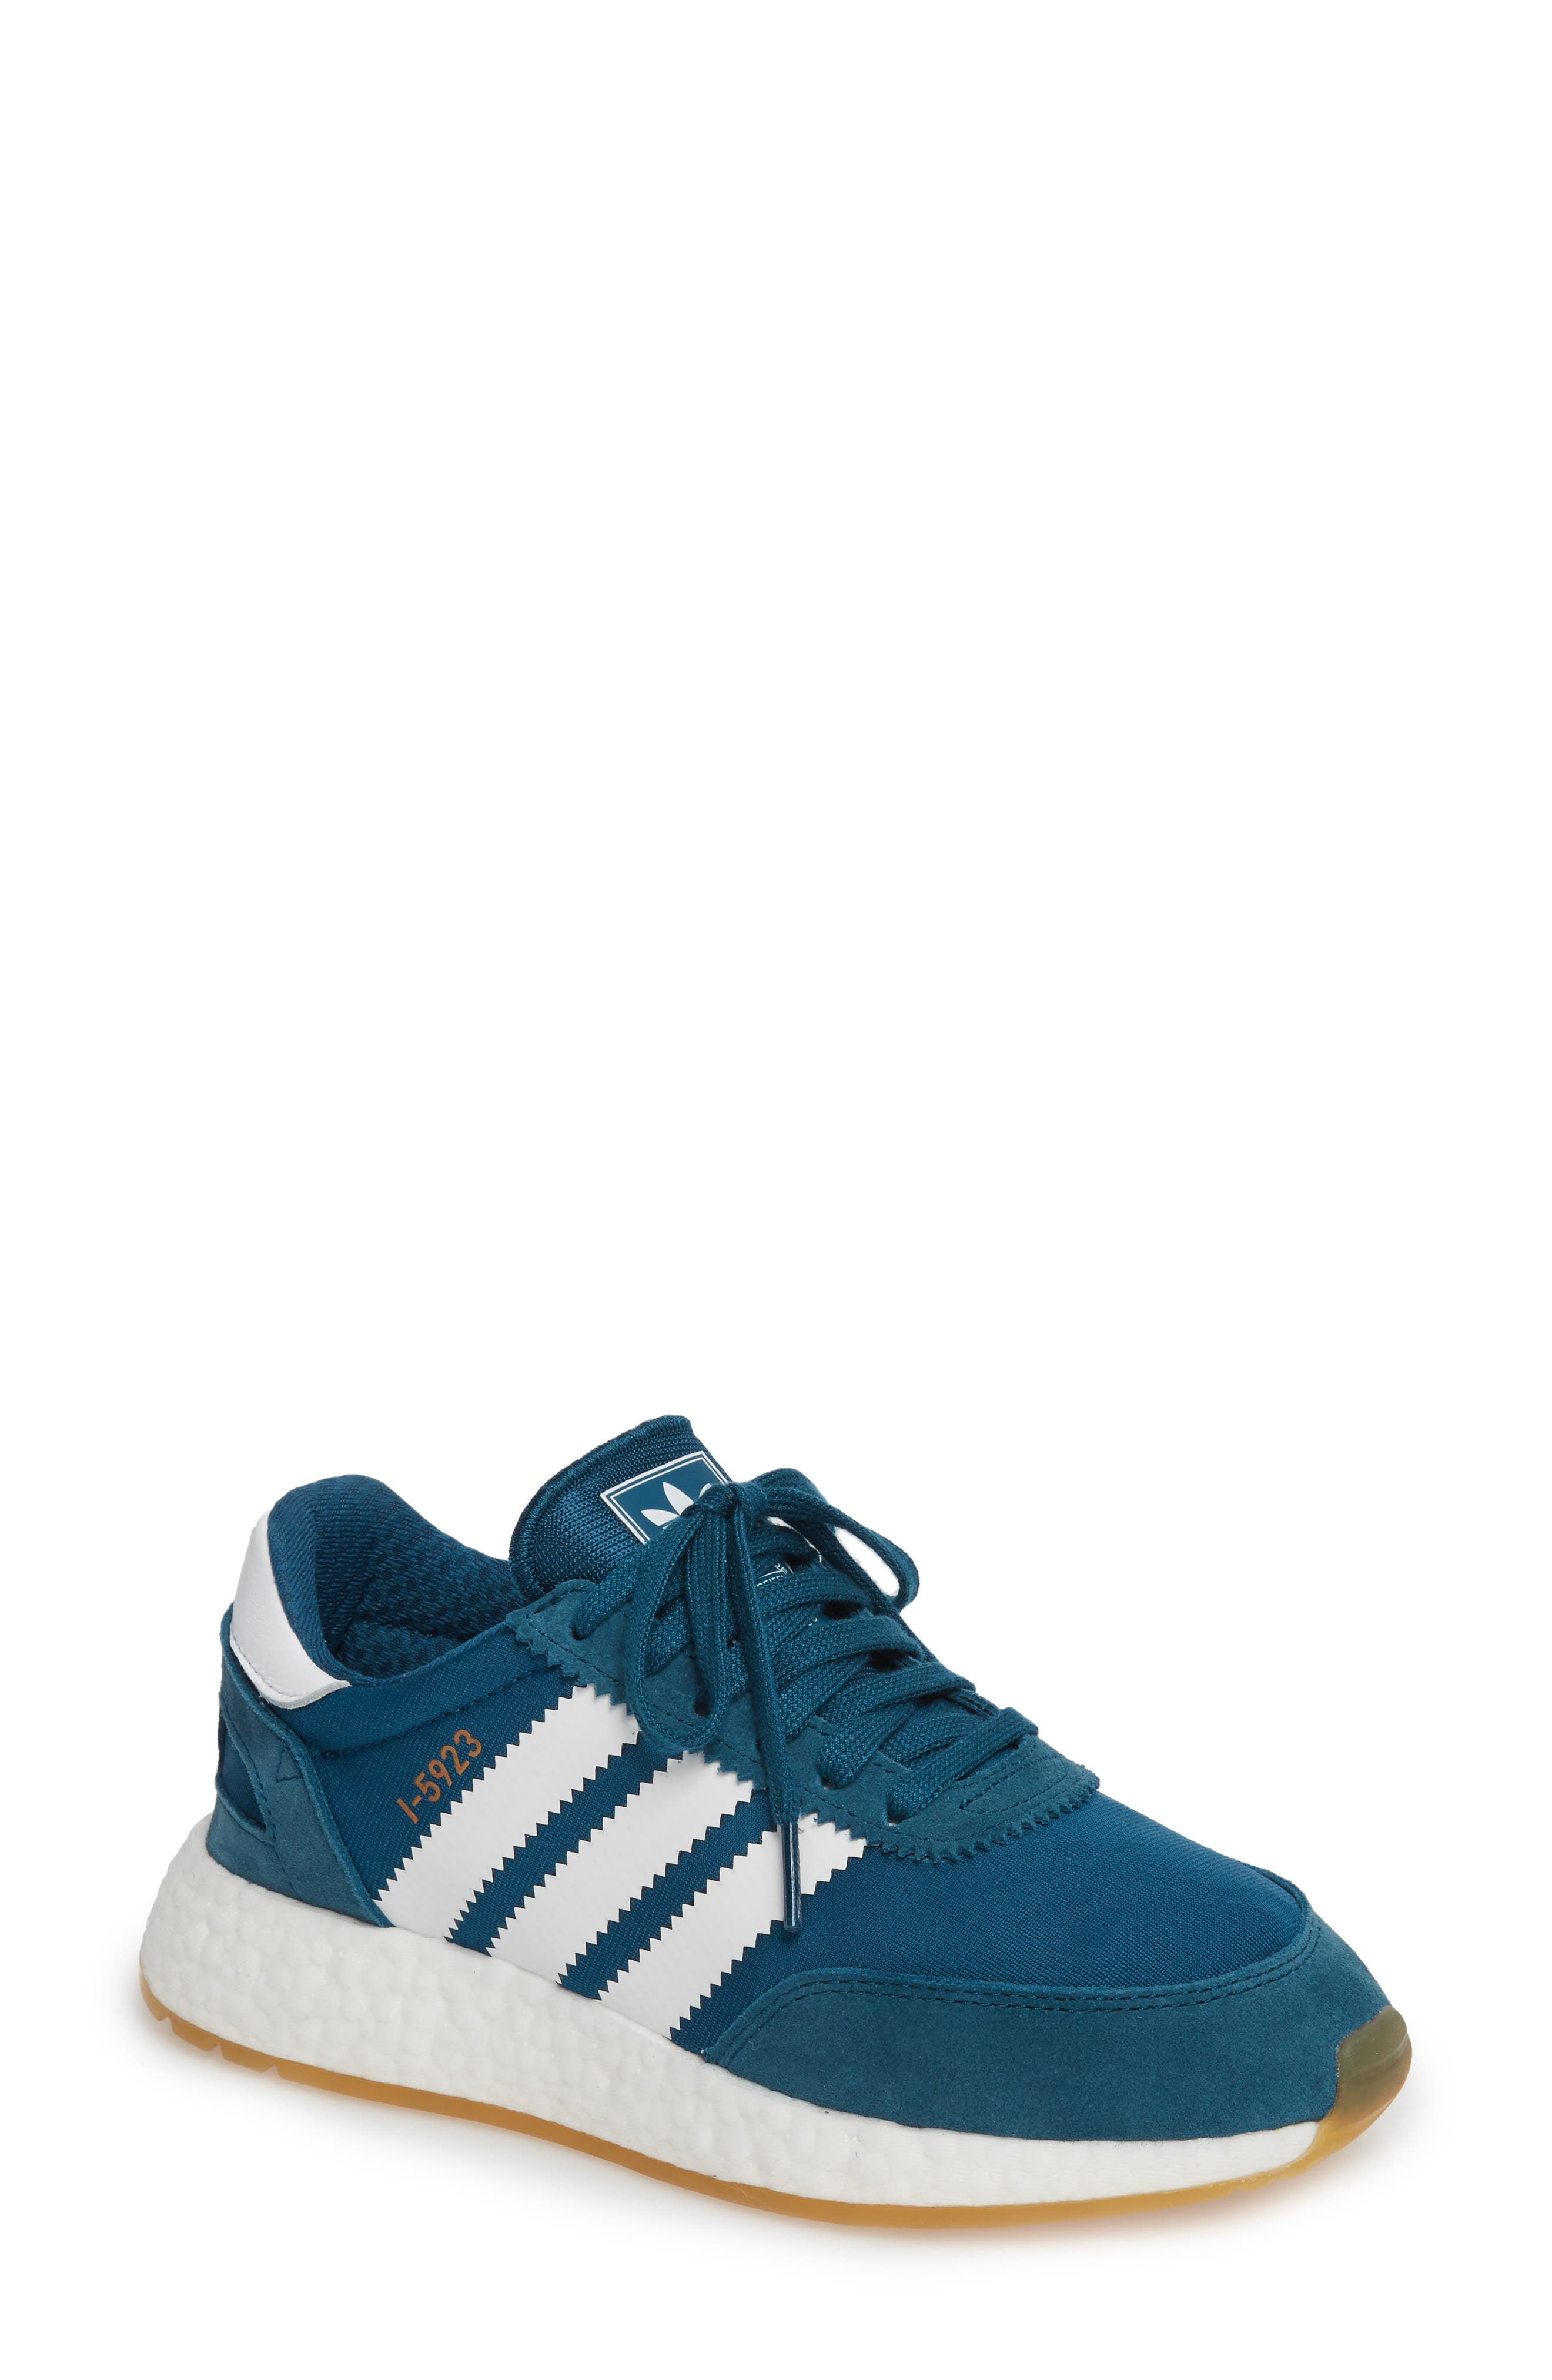 I-5923 Sneaker,                             Main thumbnail 8, color,